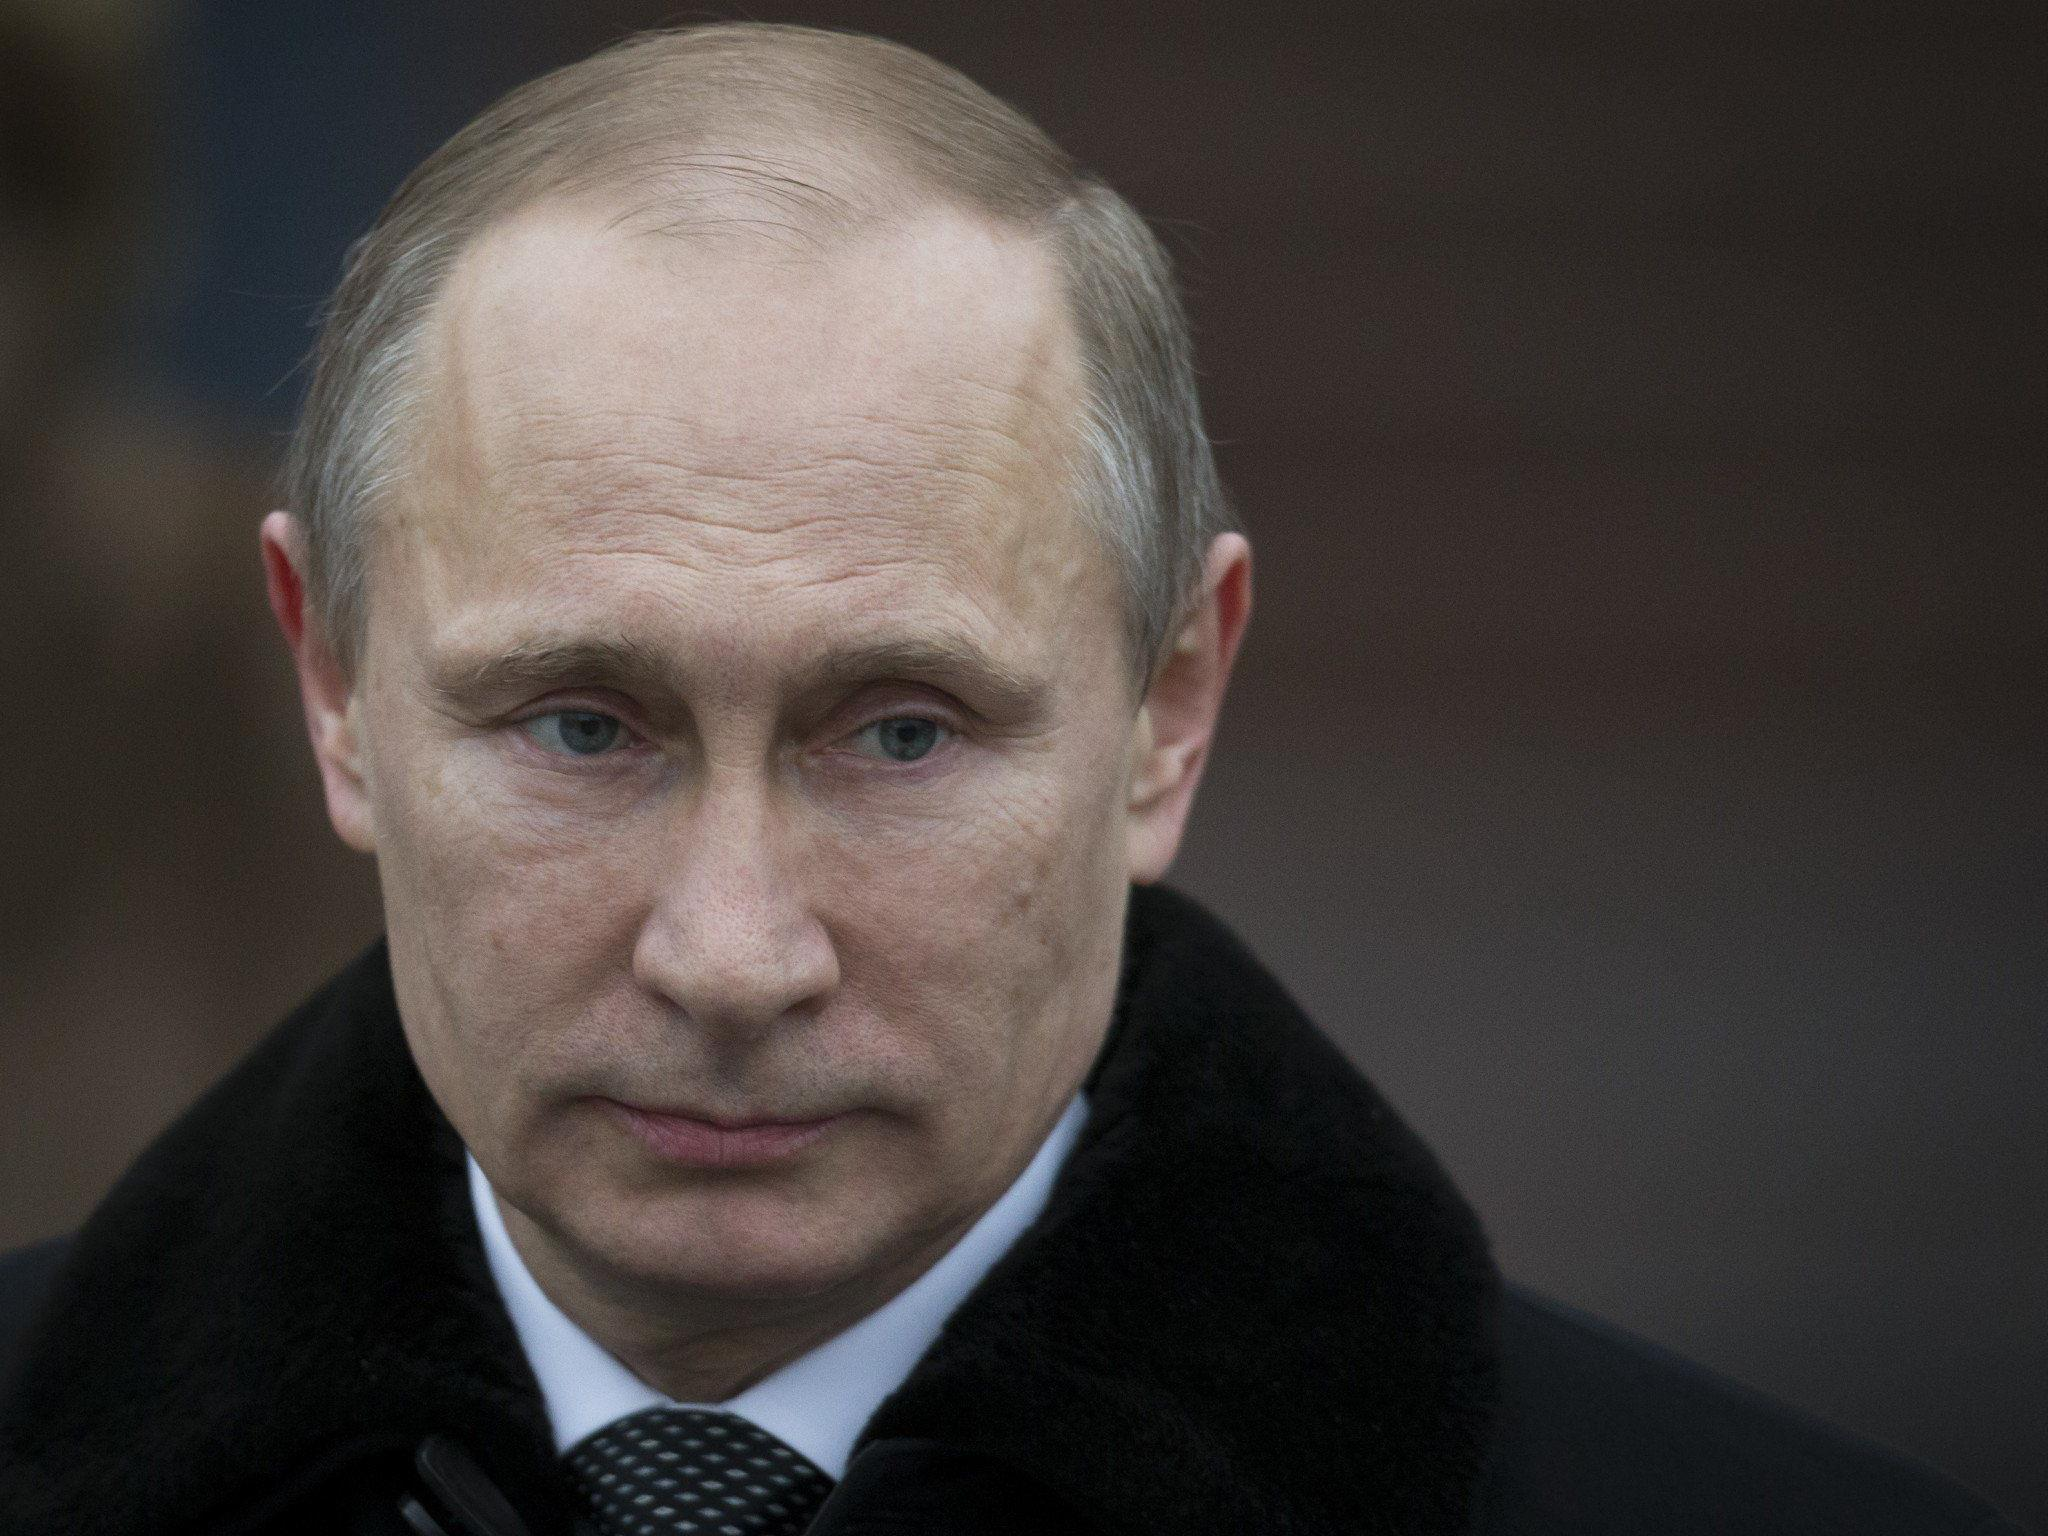 Russlands Präsident droht neben Einfluss- auch Gesichtsverlust.